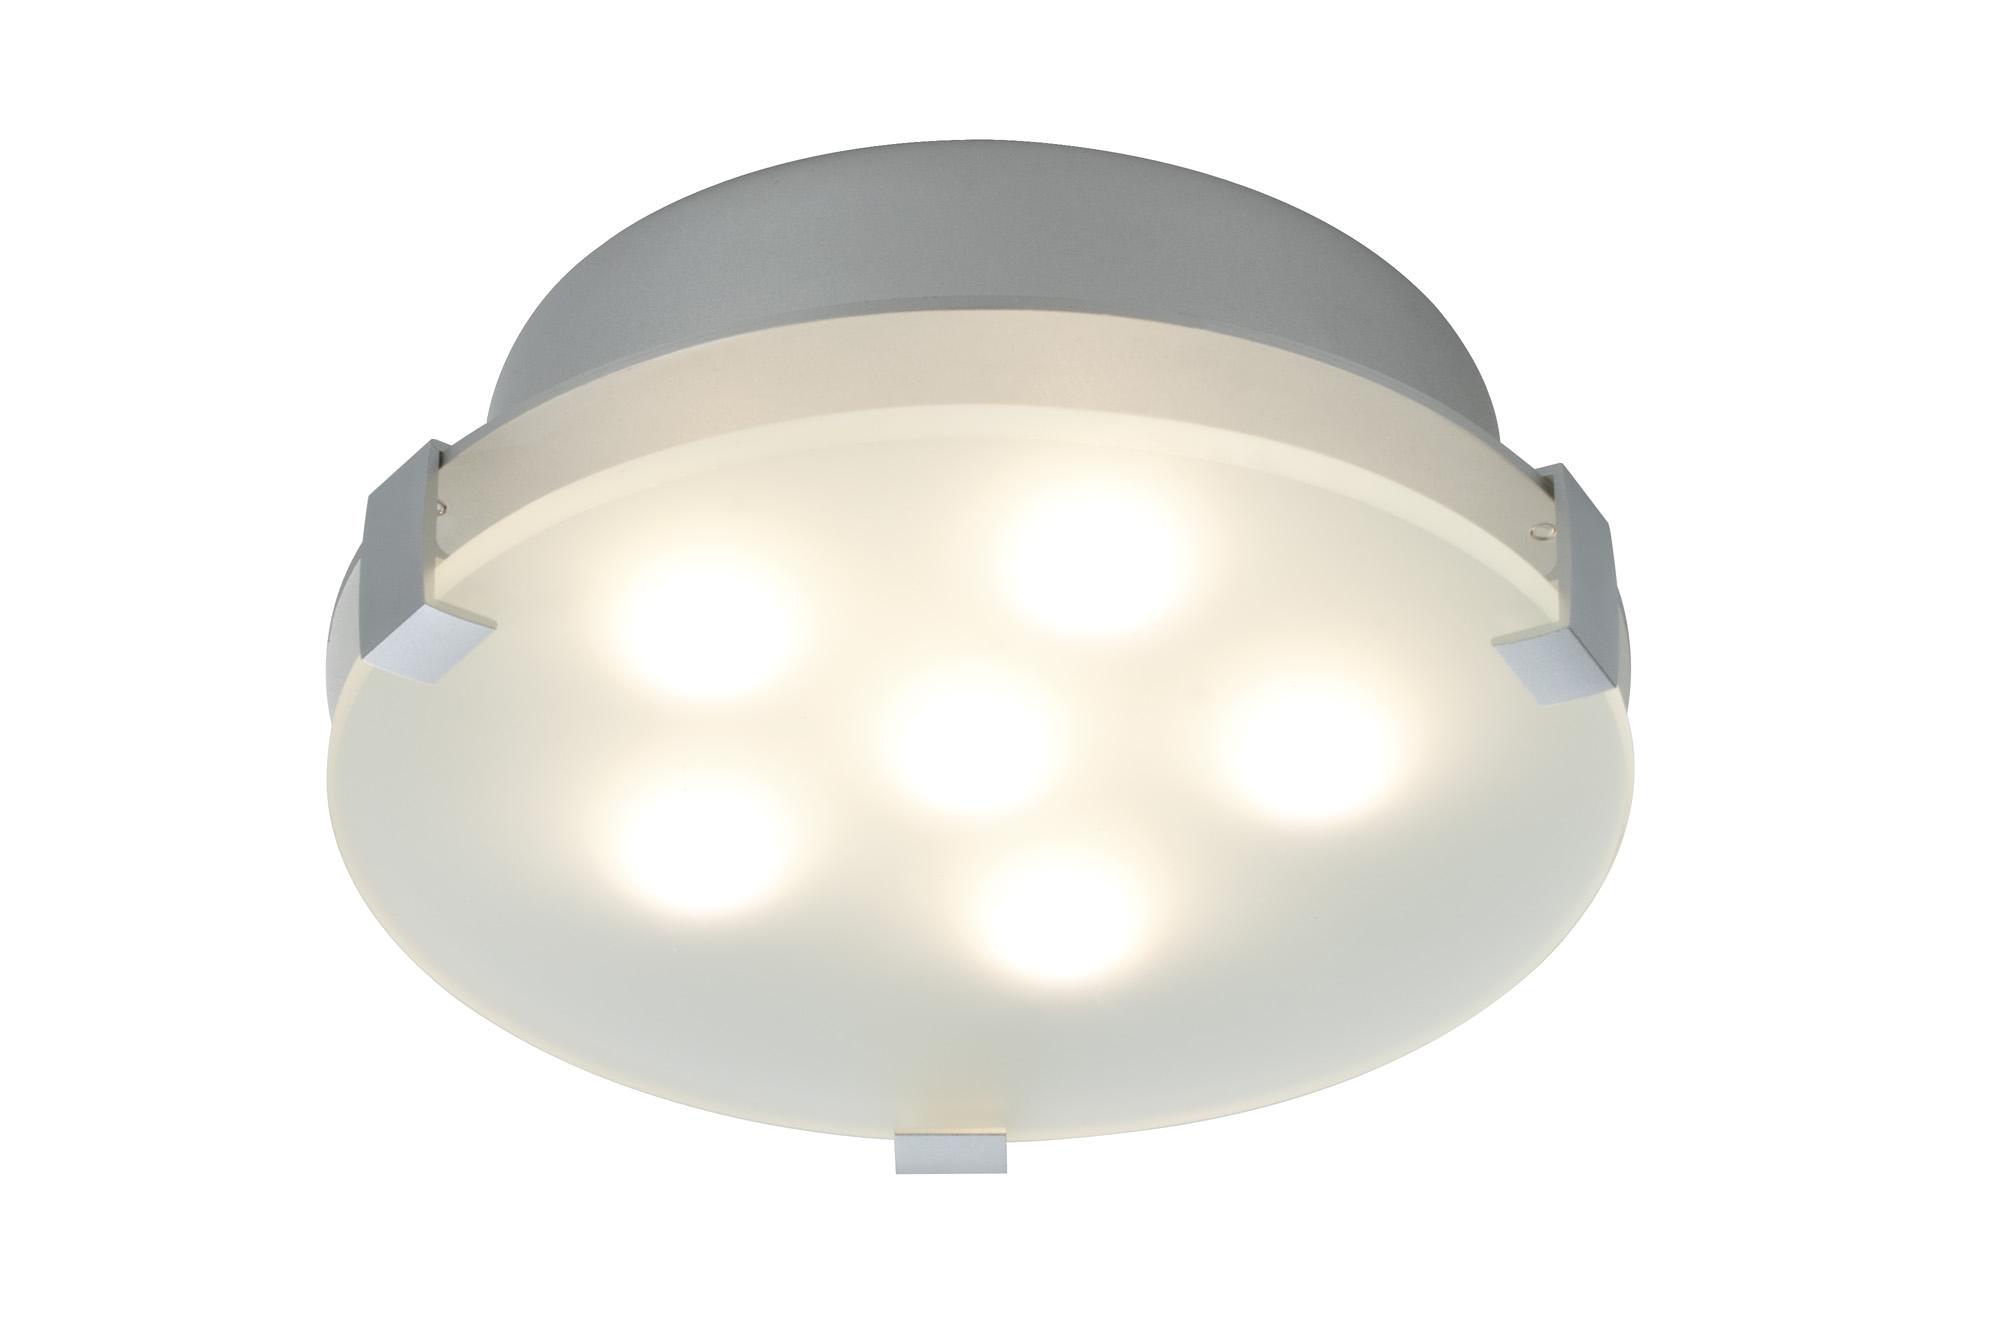 Paulmann. 70279 W-D Xeta dimm IR Fernb LED 15W Chr-m